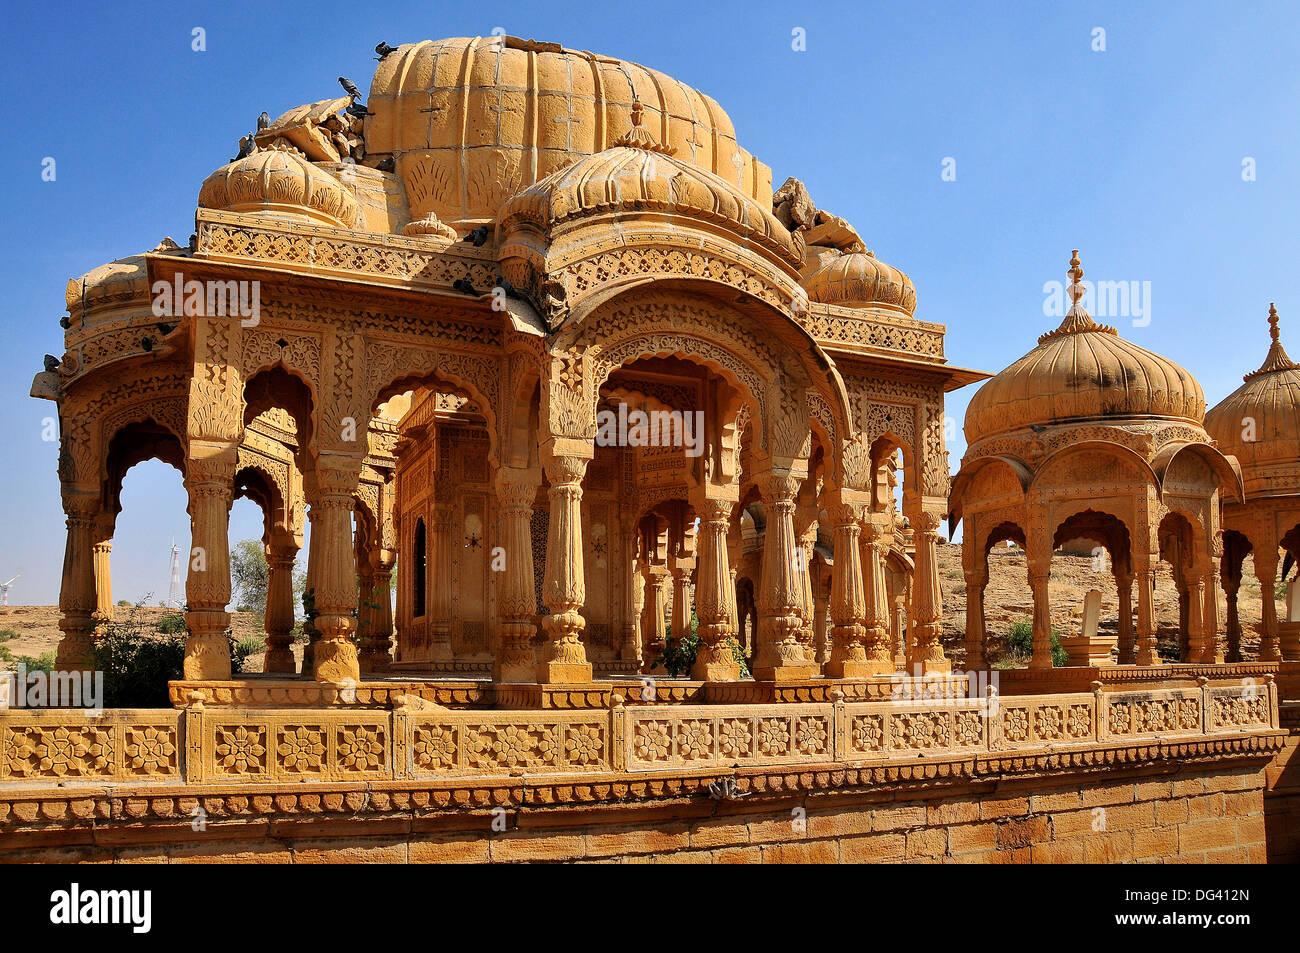 Bada Bagh (Barabagh), royal cenotaphs (chhatris) of Maharajas of Jaisalmer State, Jaisalmer, Rajasthan, India, Asia - Stock Image